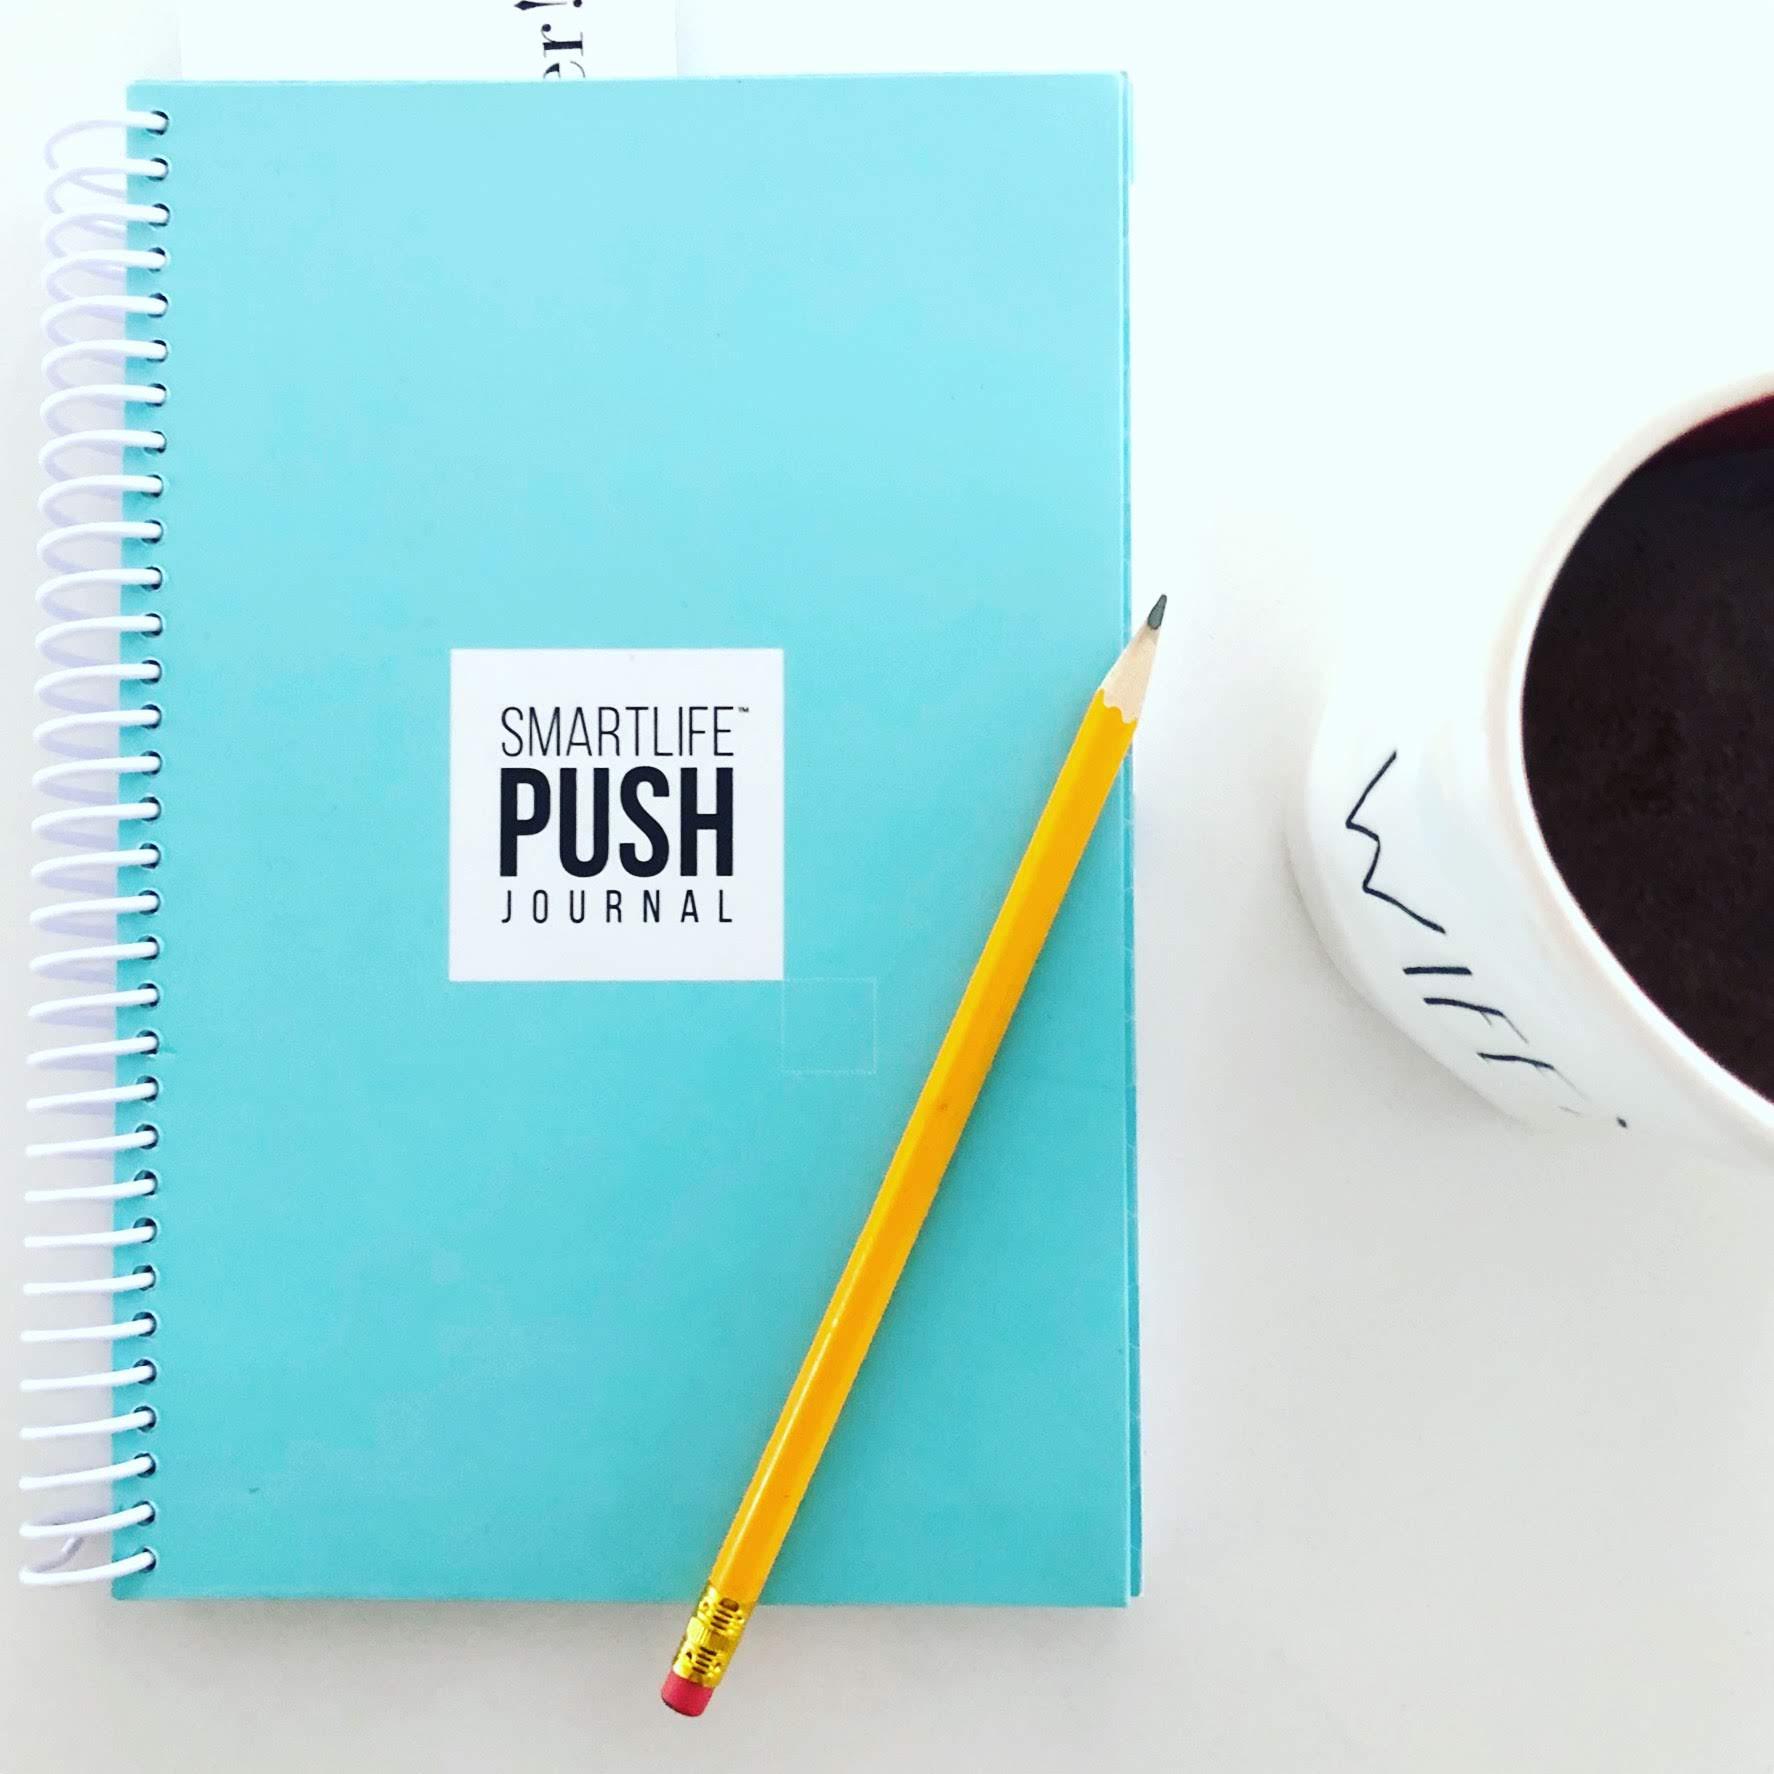 Smartlife-push-journal.JPG